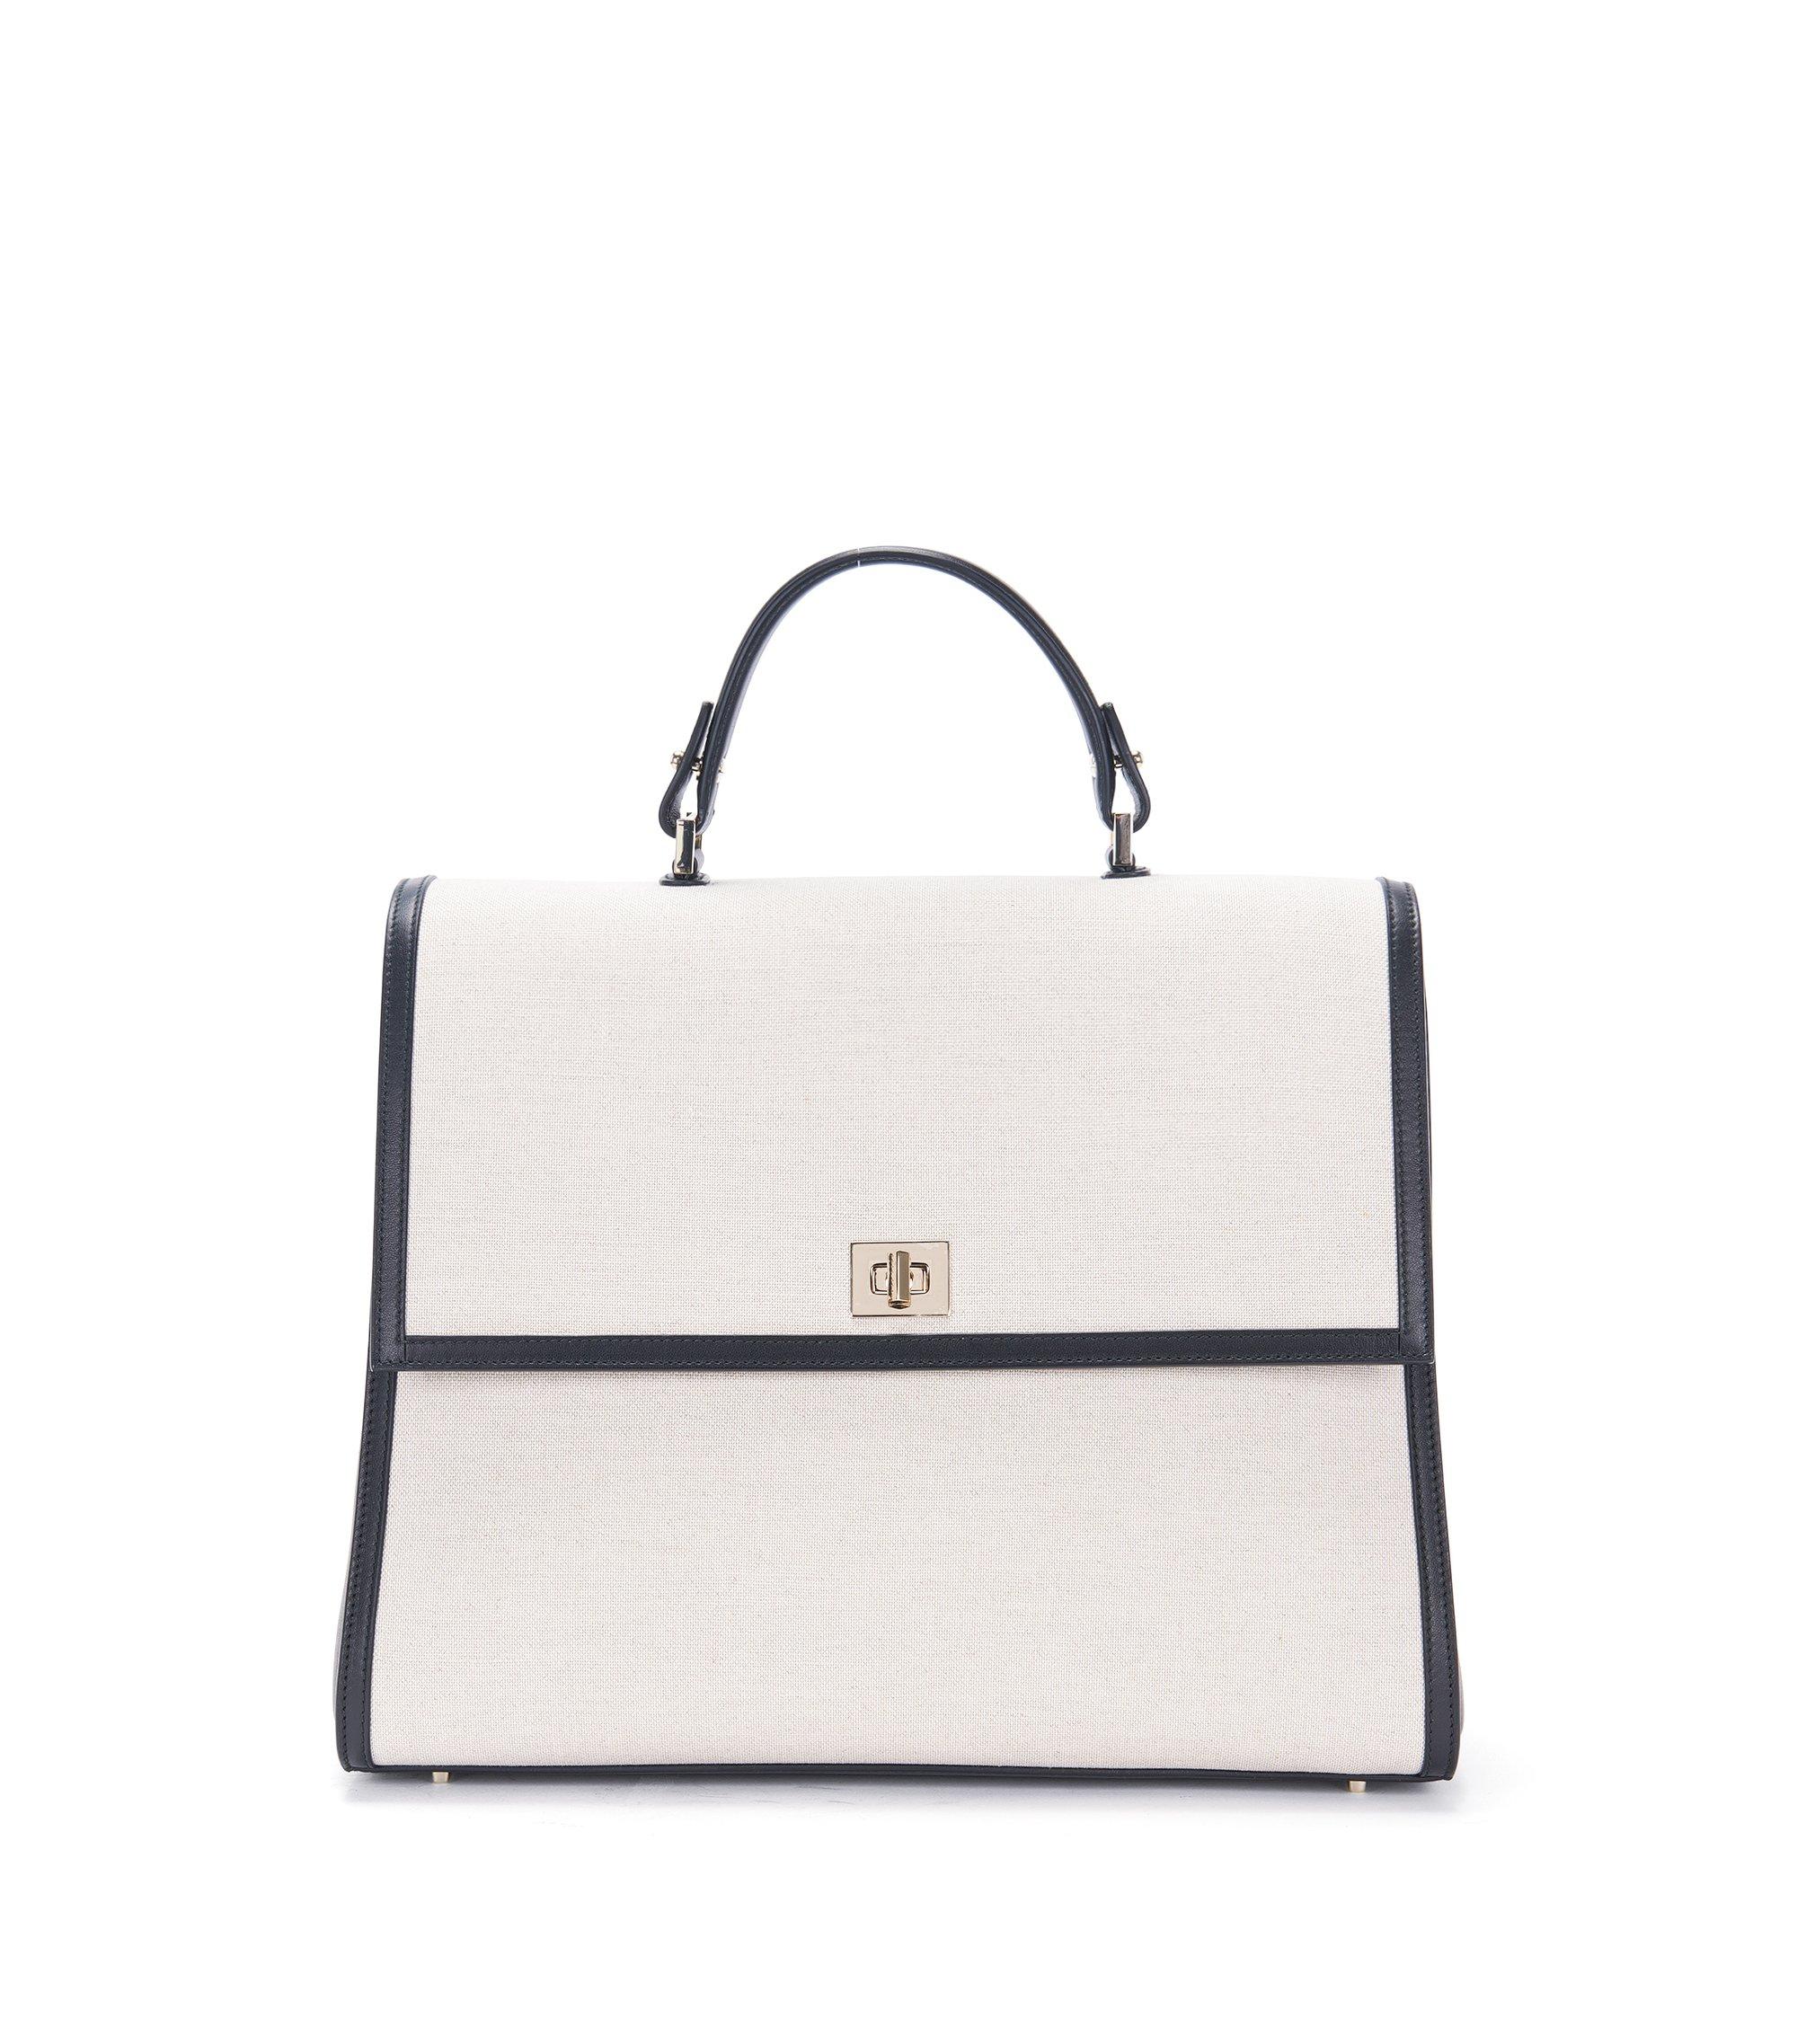 Leather-Trimmed Cotton-Linen Handbag | BOSS Bespoke TH M SC, Natural